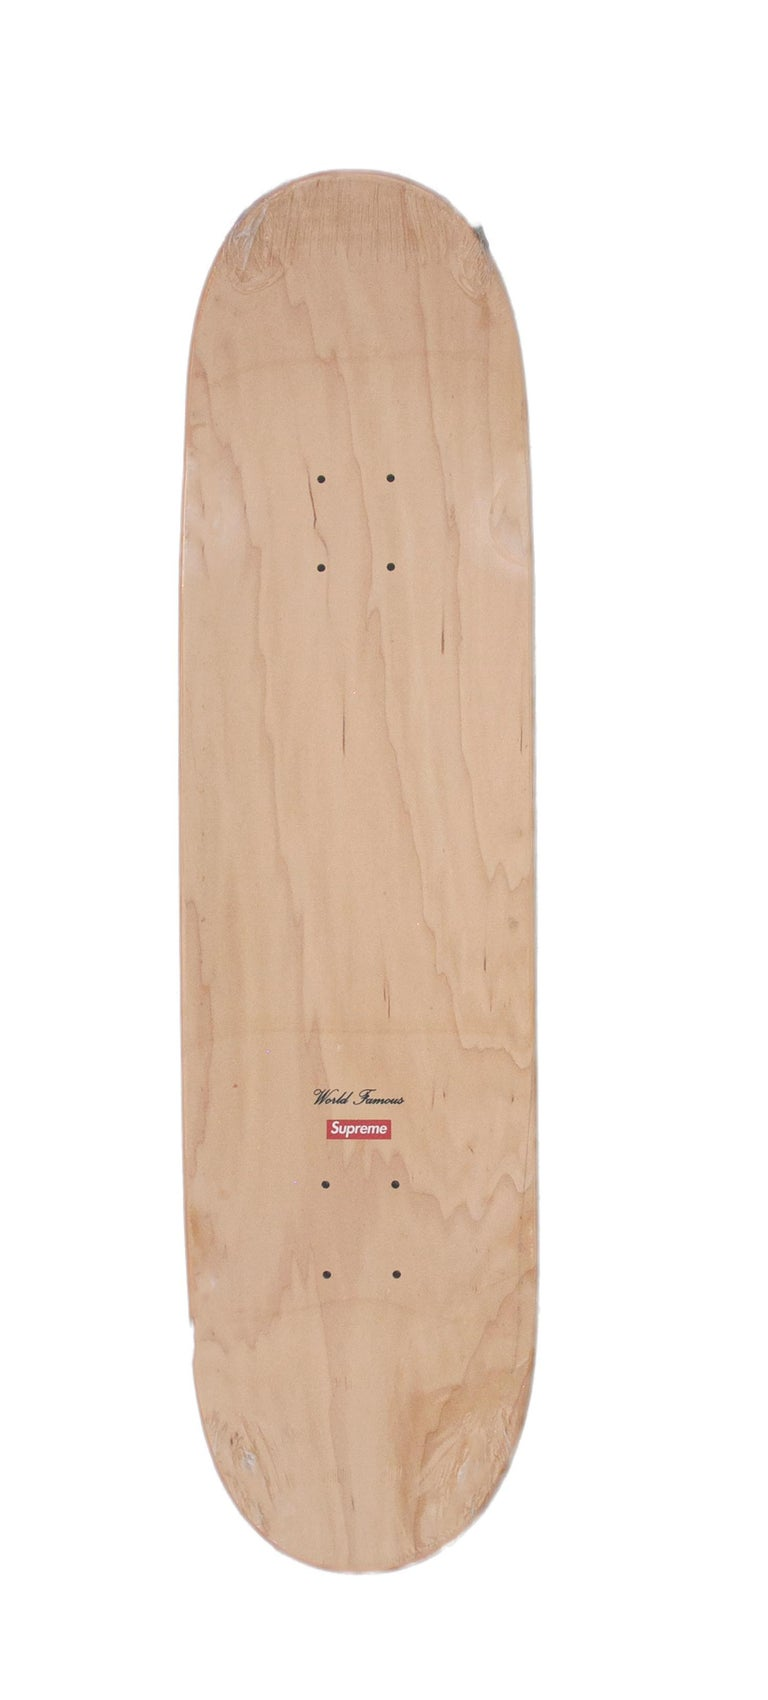 Supreme Bling Skateboard Deck Gold - Year 2013 - Pop Art Mixed Media Art by Supreme